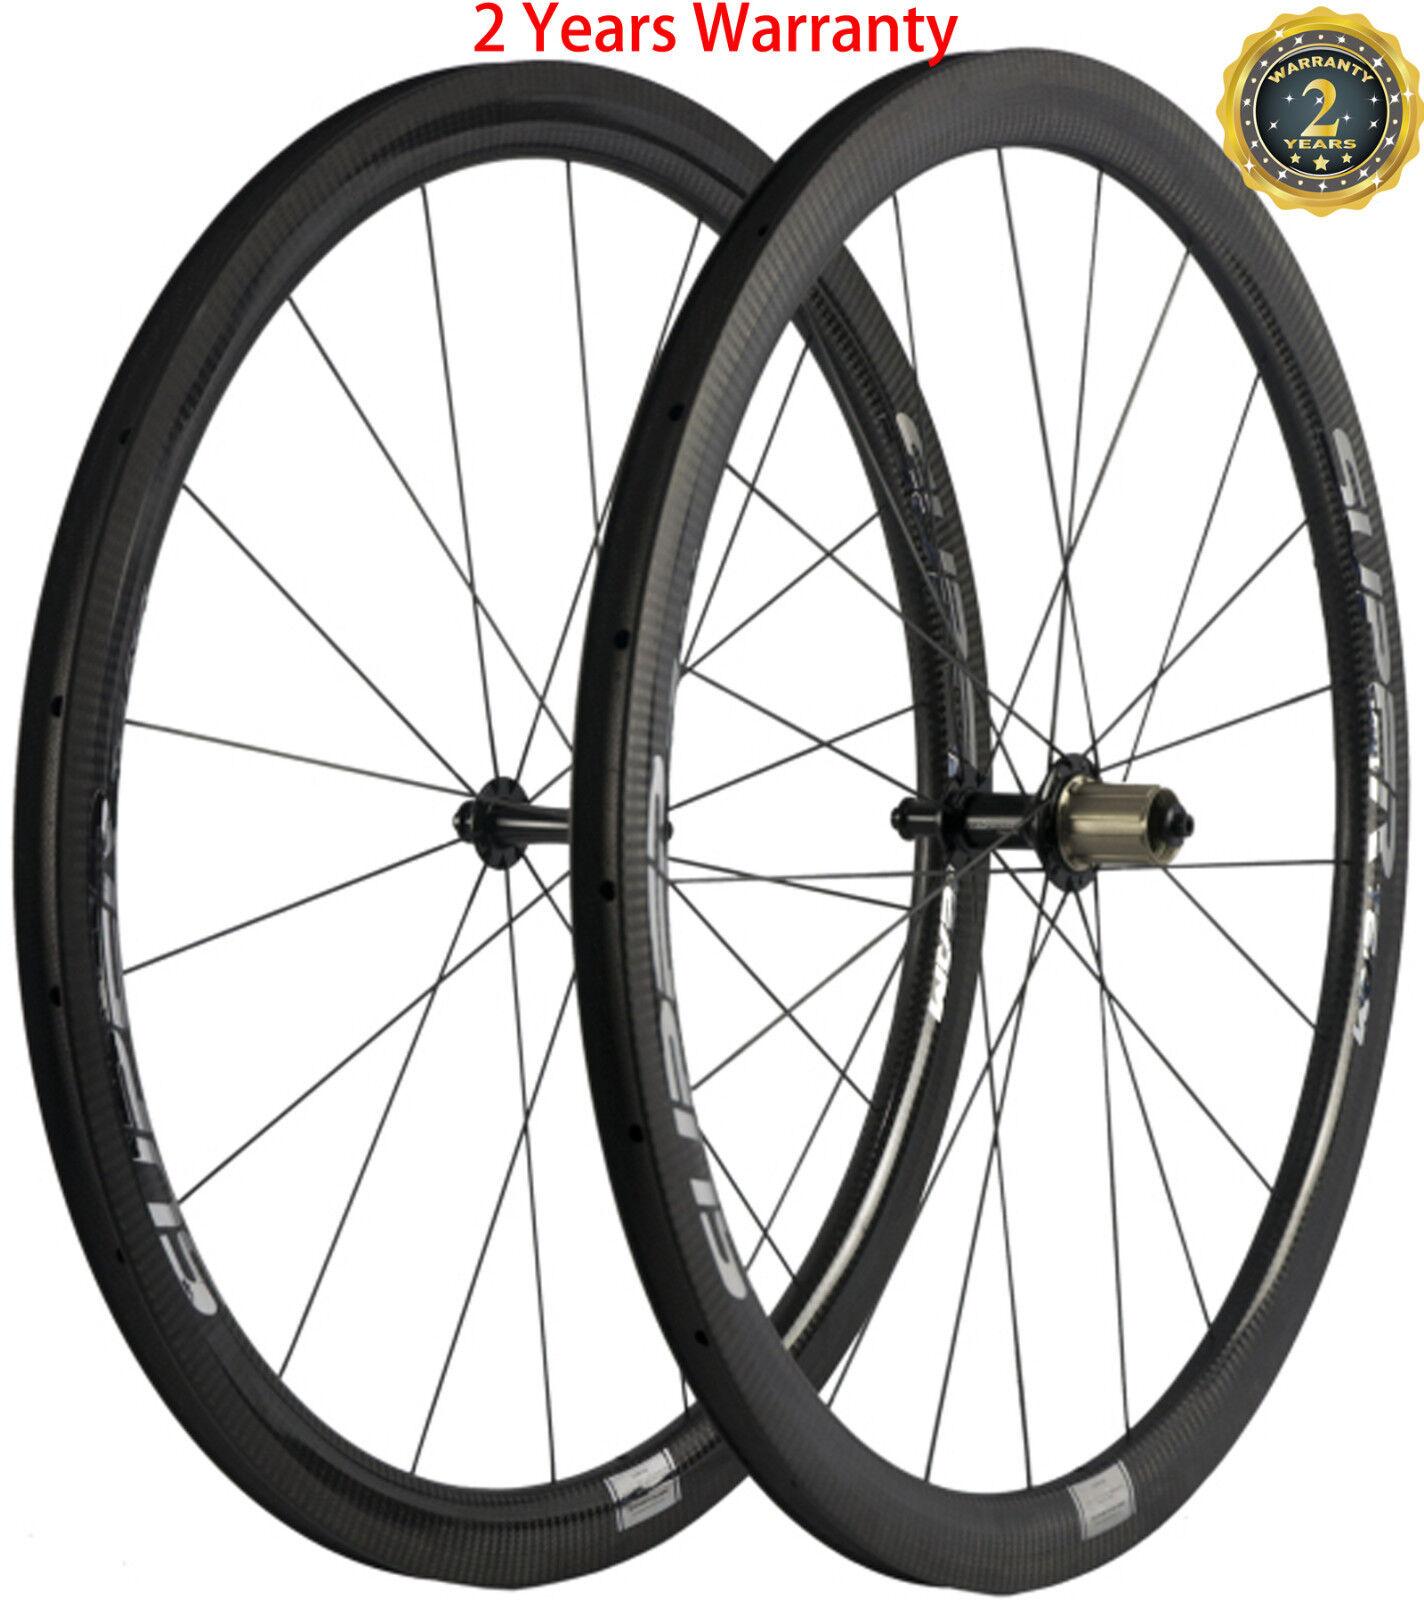 Full Carbon Fiber Wheels Wheelset 40mm  U Shape 25mm Width Light Weight Smith Hub  for cheap